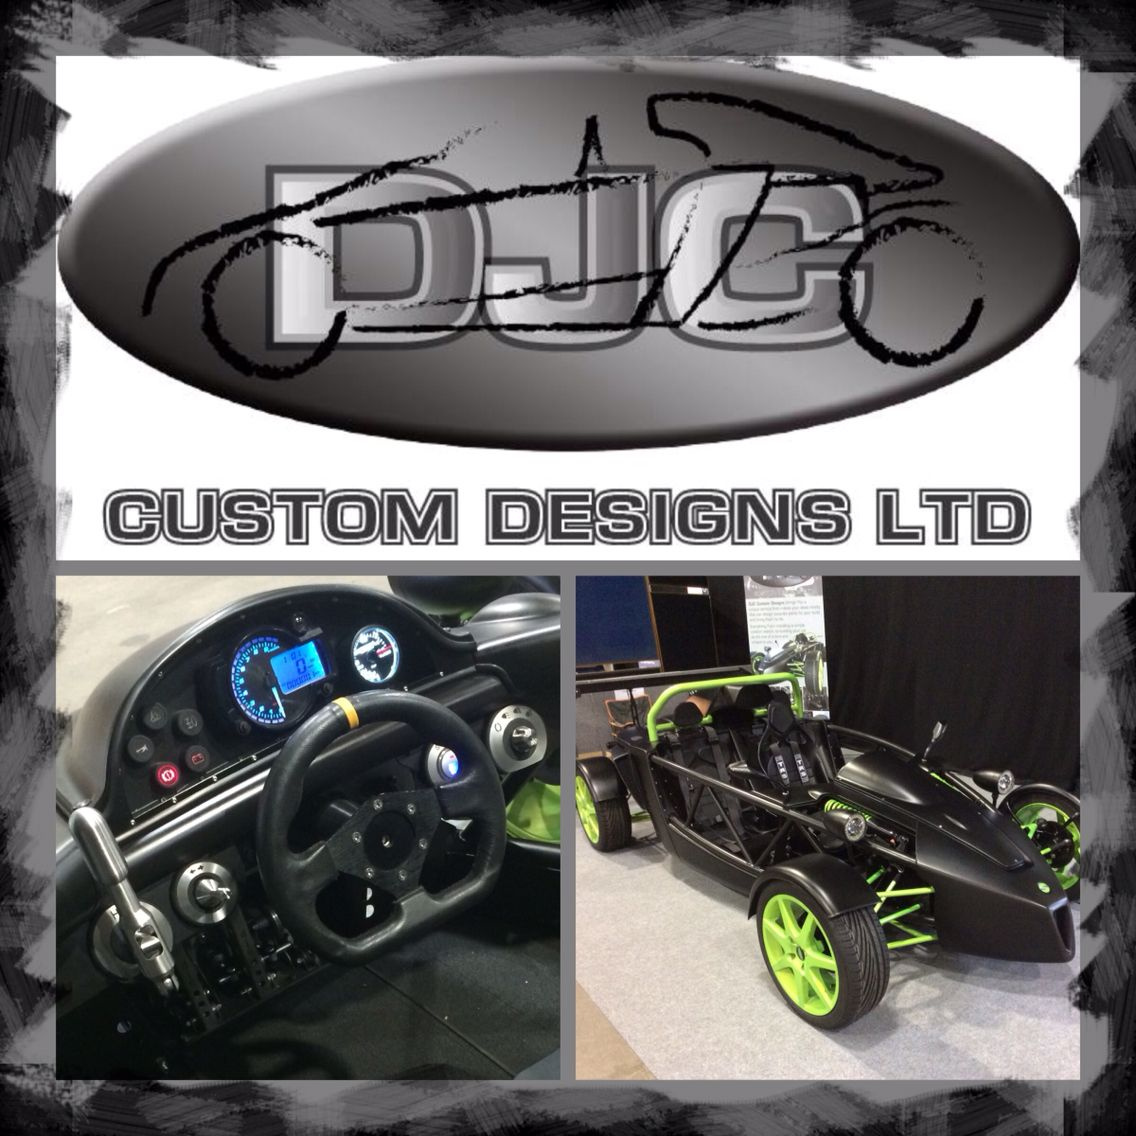 Vstorm kit car by DJC Custom Designs Ltd